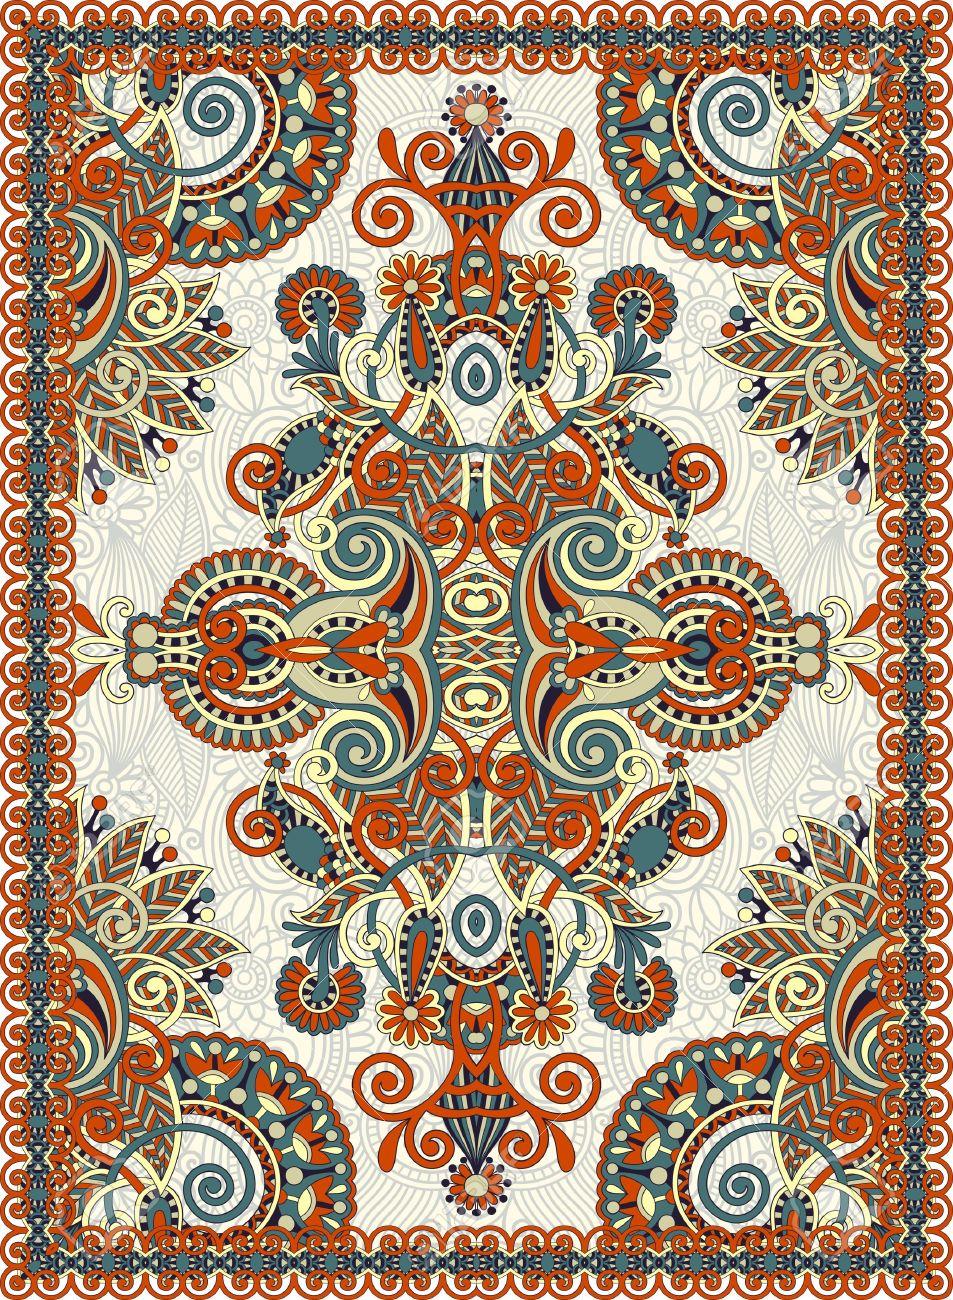 carpet design images carpet design xqwmlvy PPVXOVE